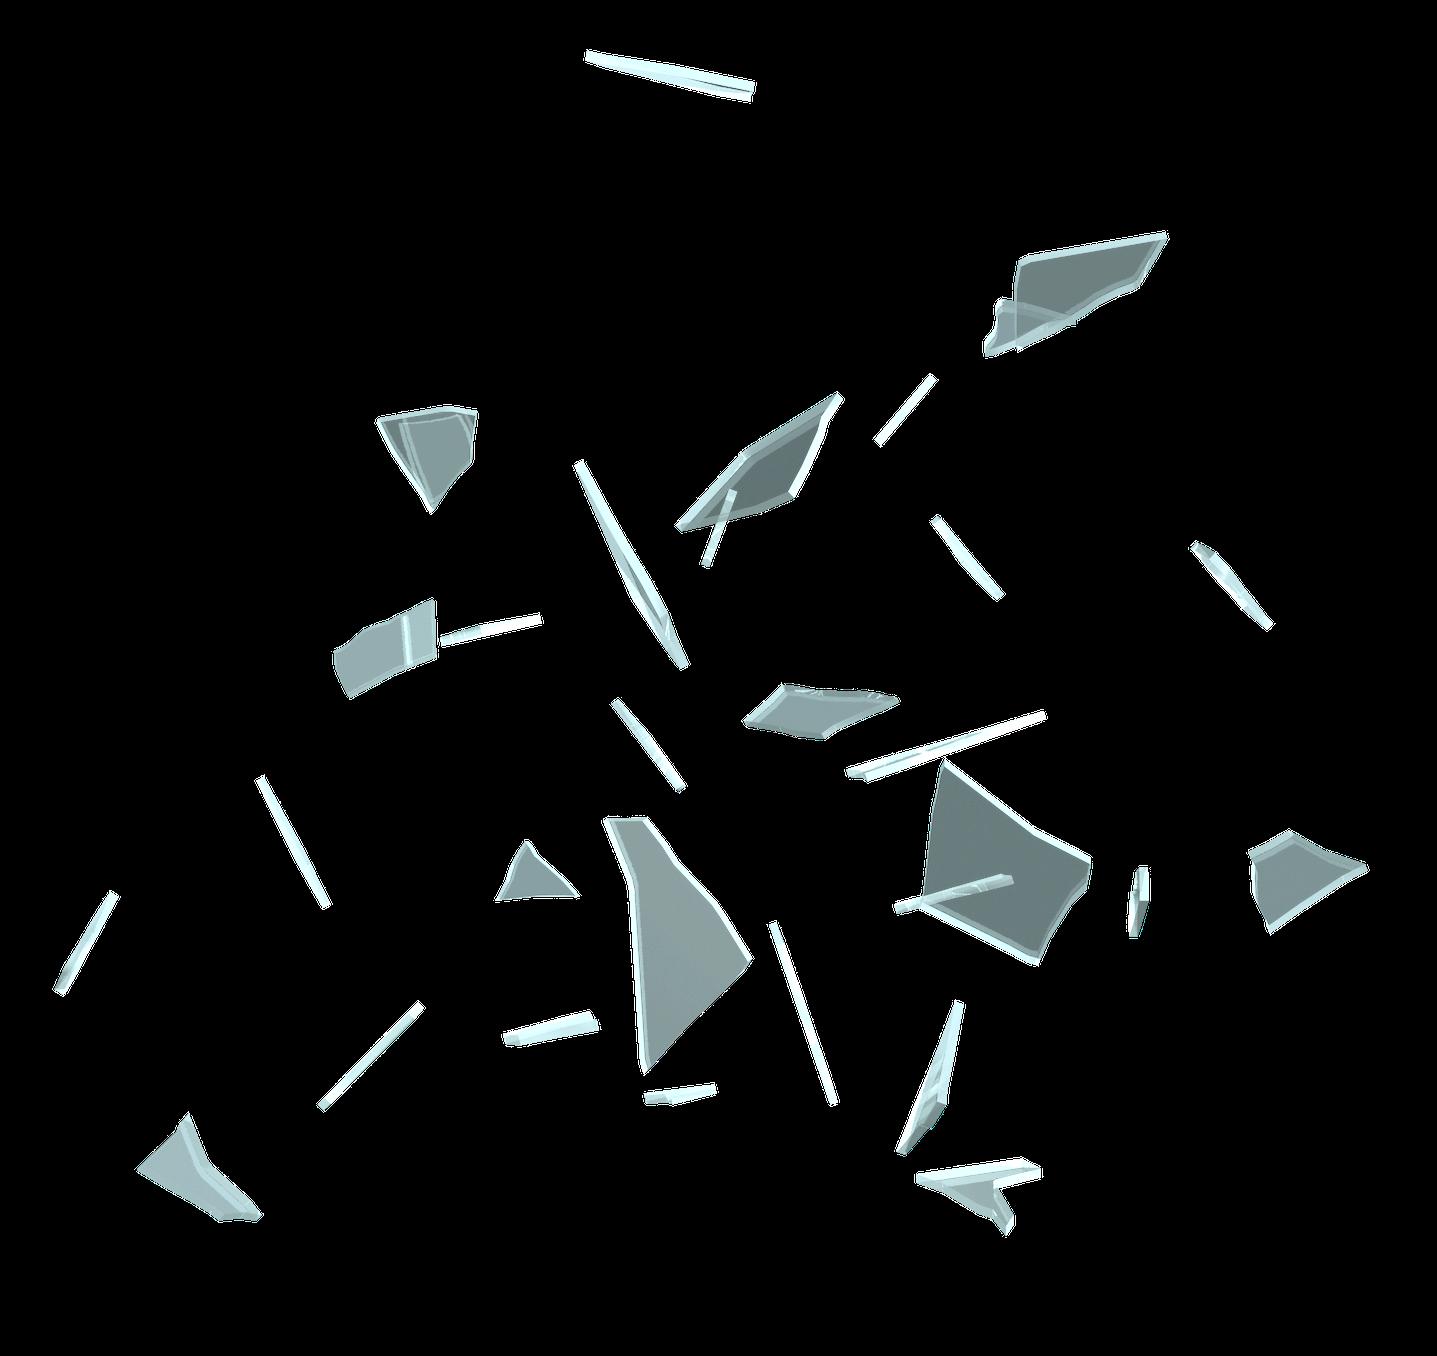 RJs Bits Bobs Props & Pieces: Broken Glass: On the Floor ...